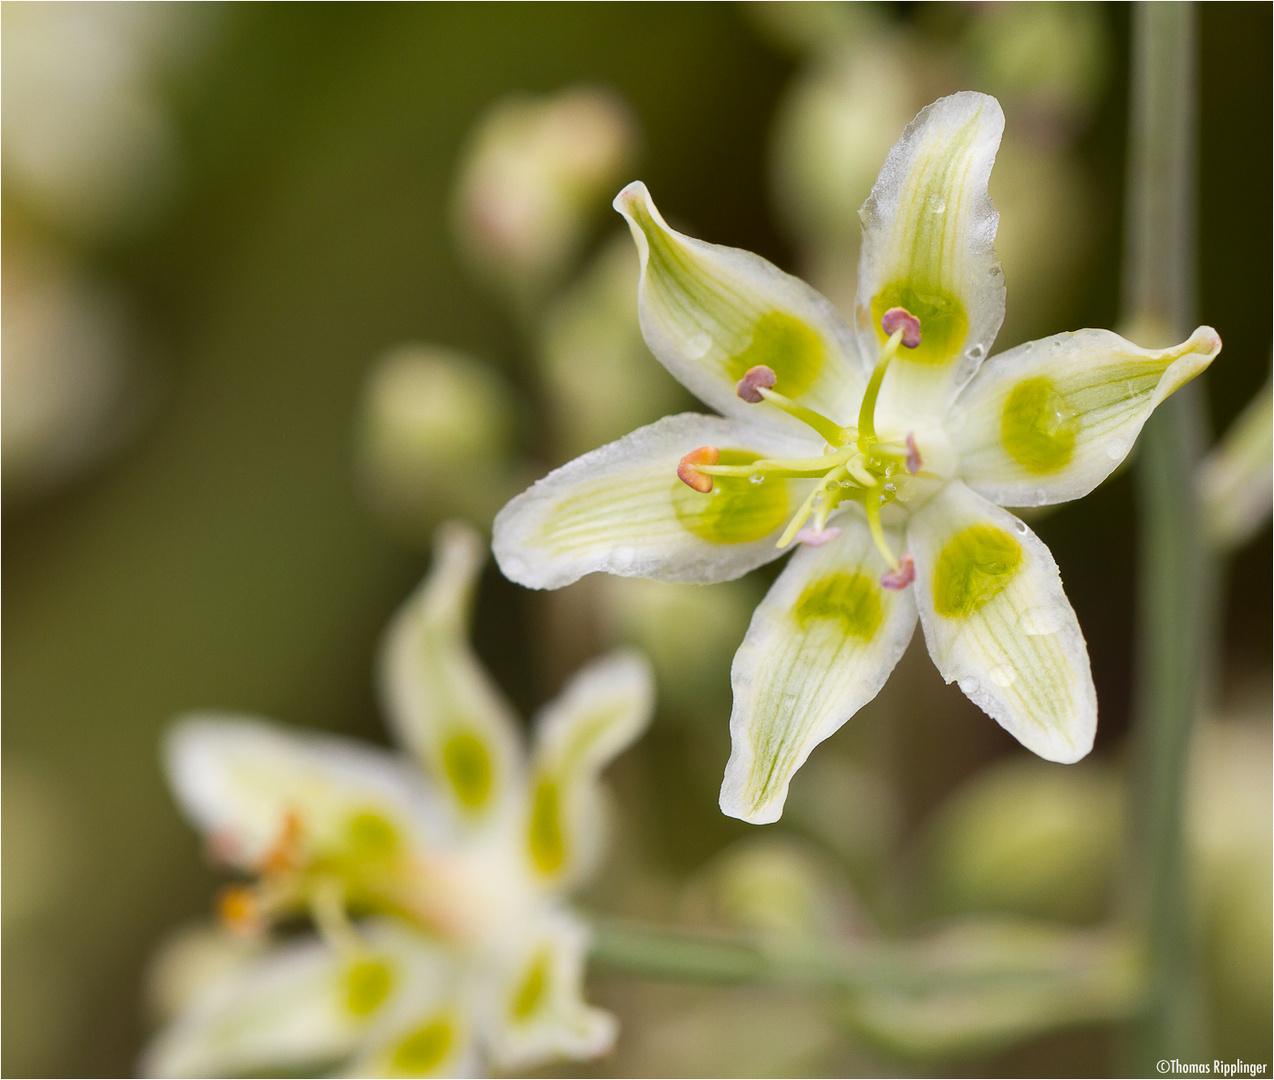 Jochlilie (Zigadenus elegans)